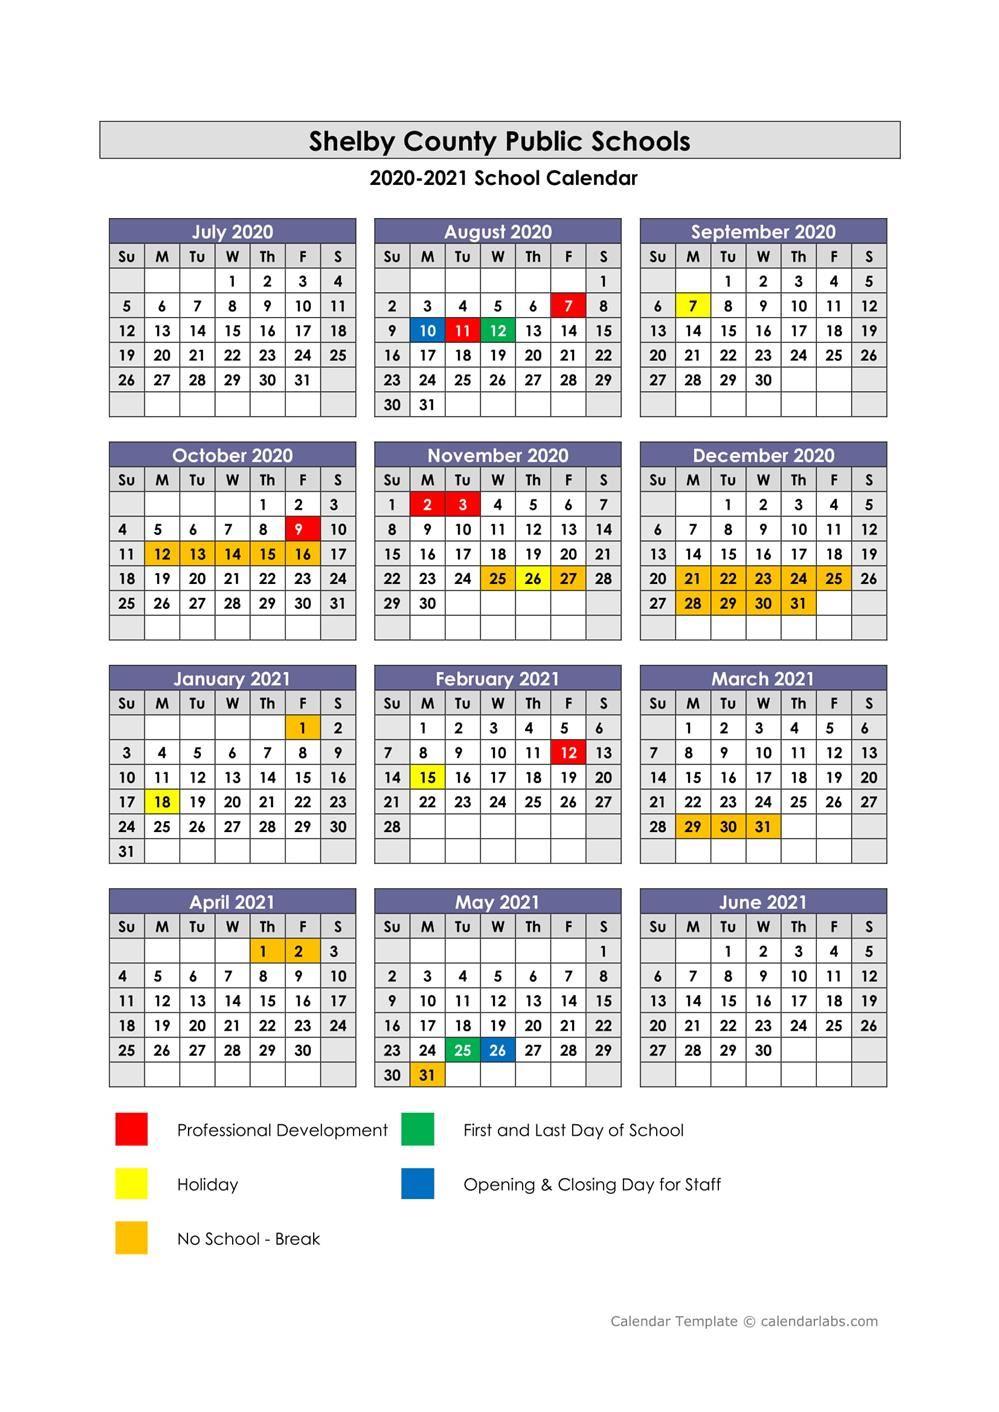 Shelby County Public Schools / Calendar